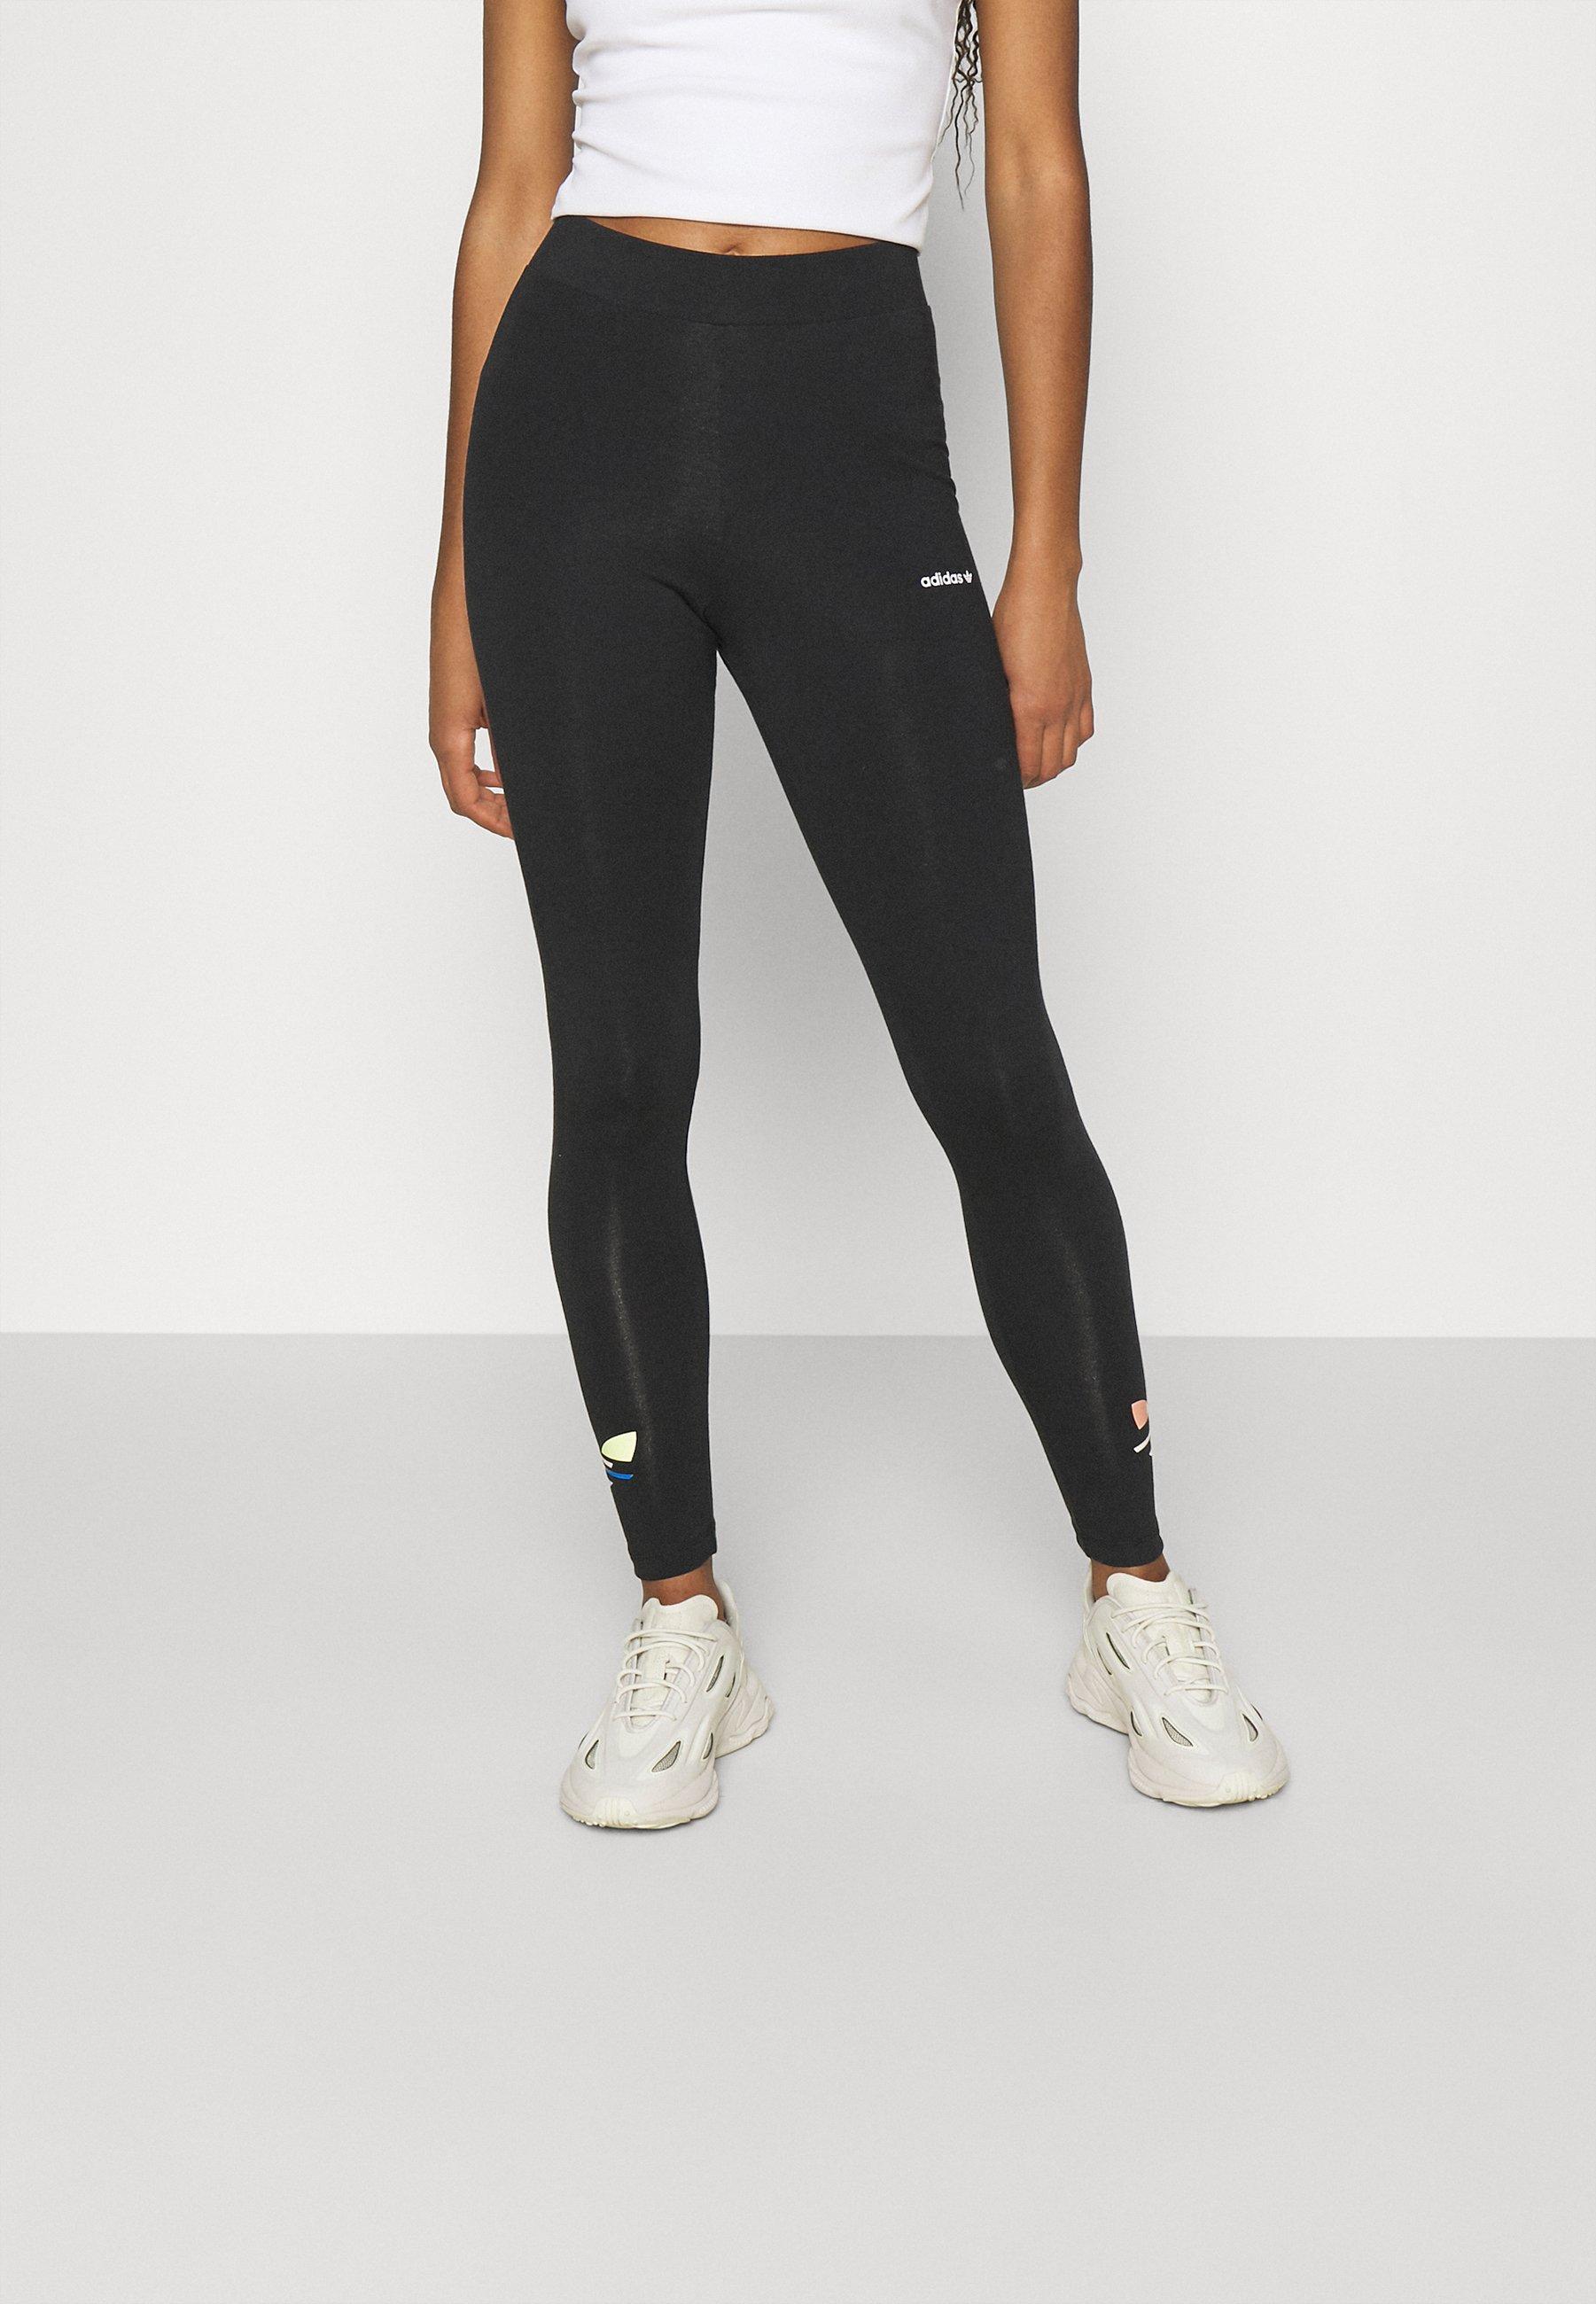 Damen TIGHTS - Leggings - Hosen